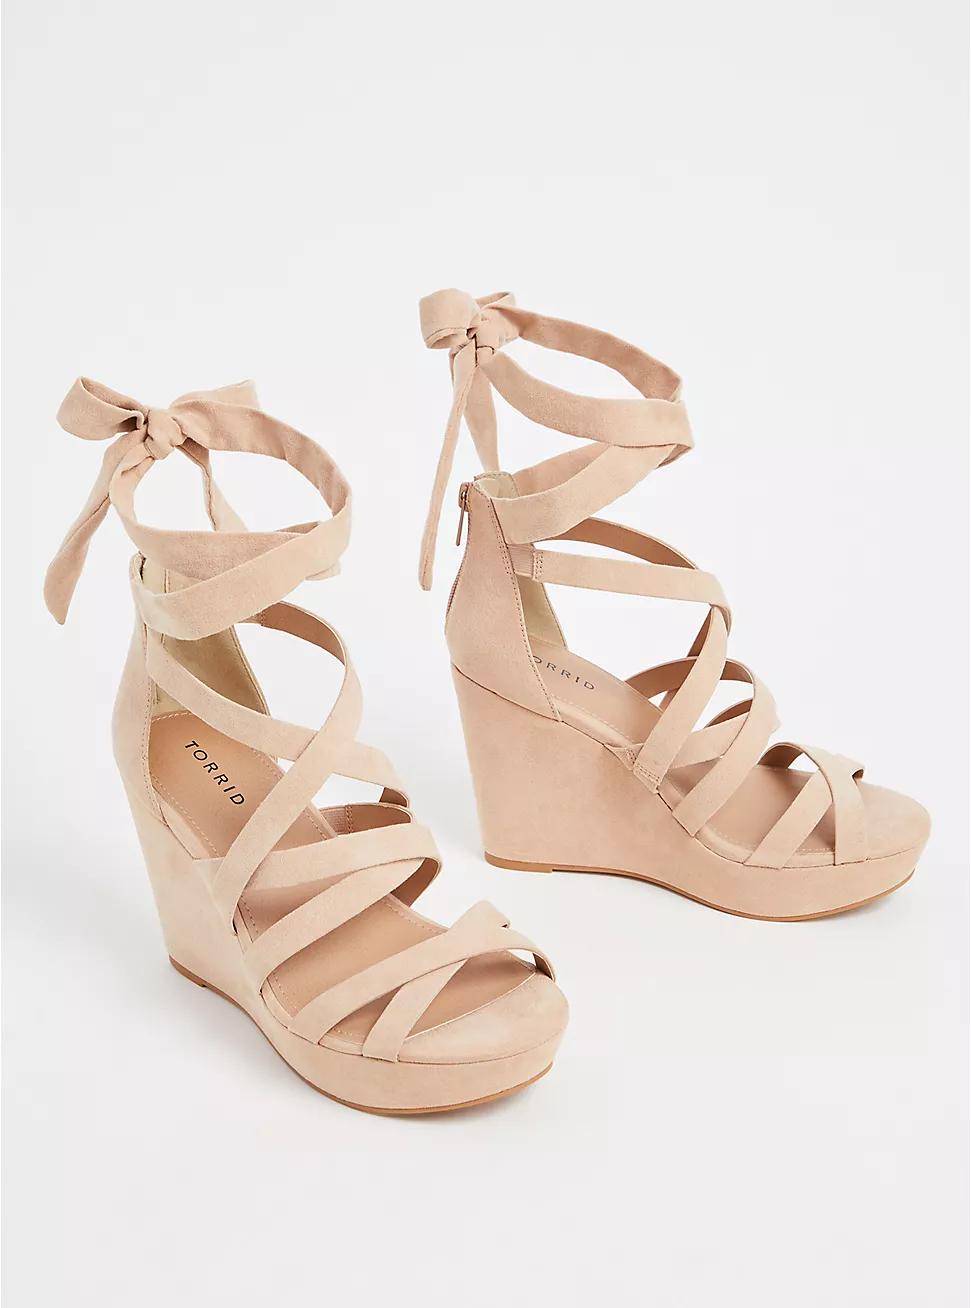 Prada Nude Suede Strappy Sandals in Beige (nude) | Lyst